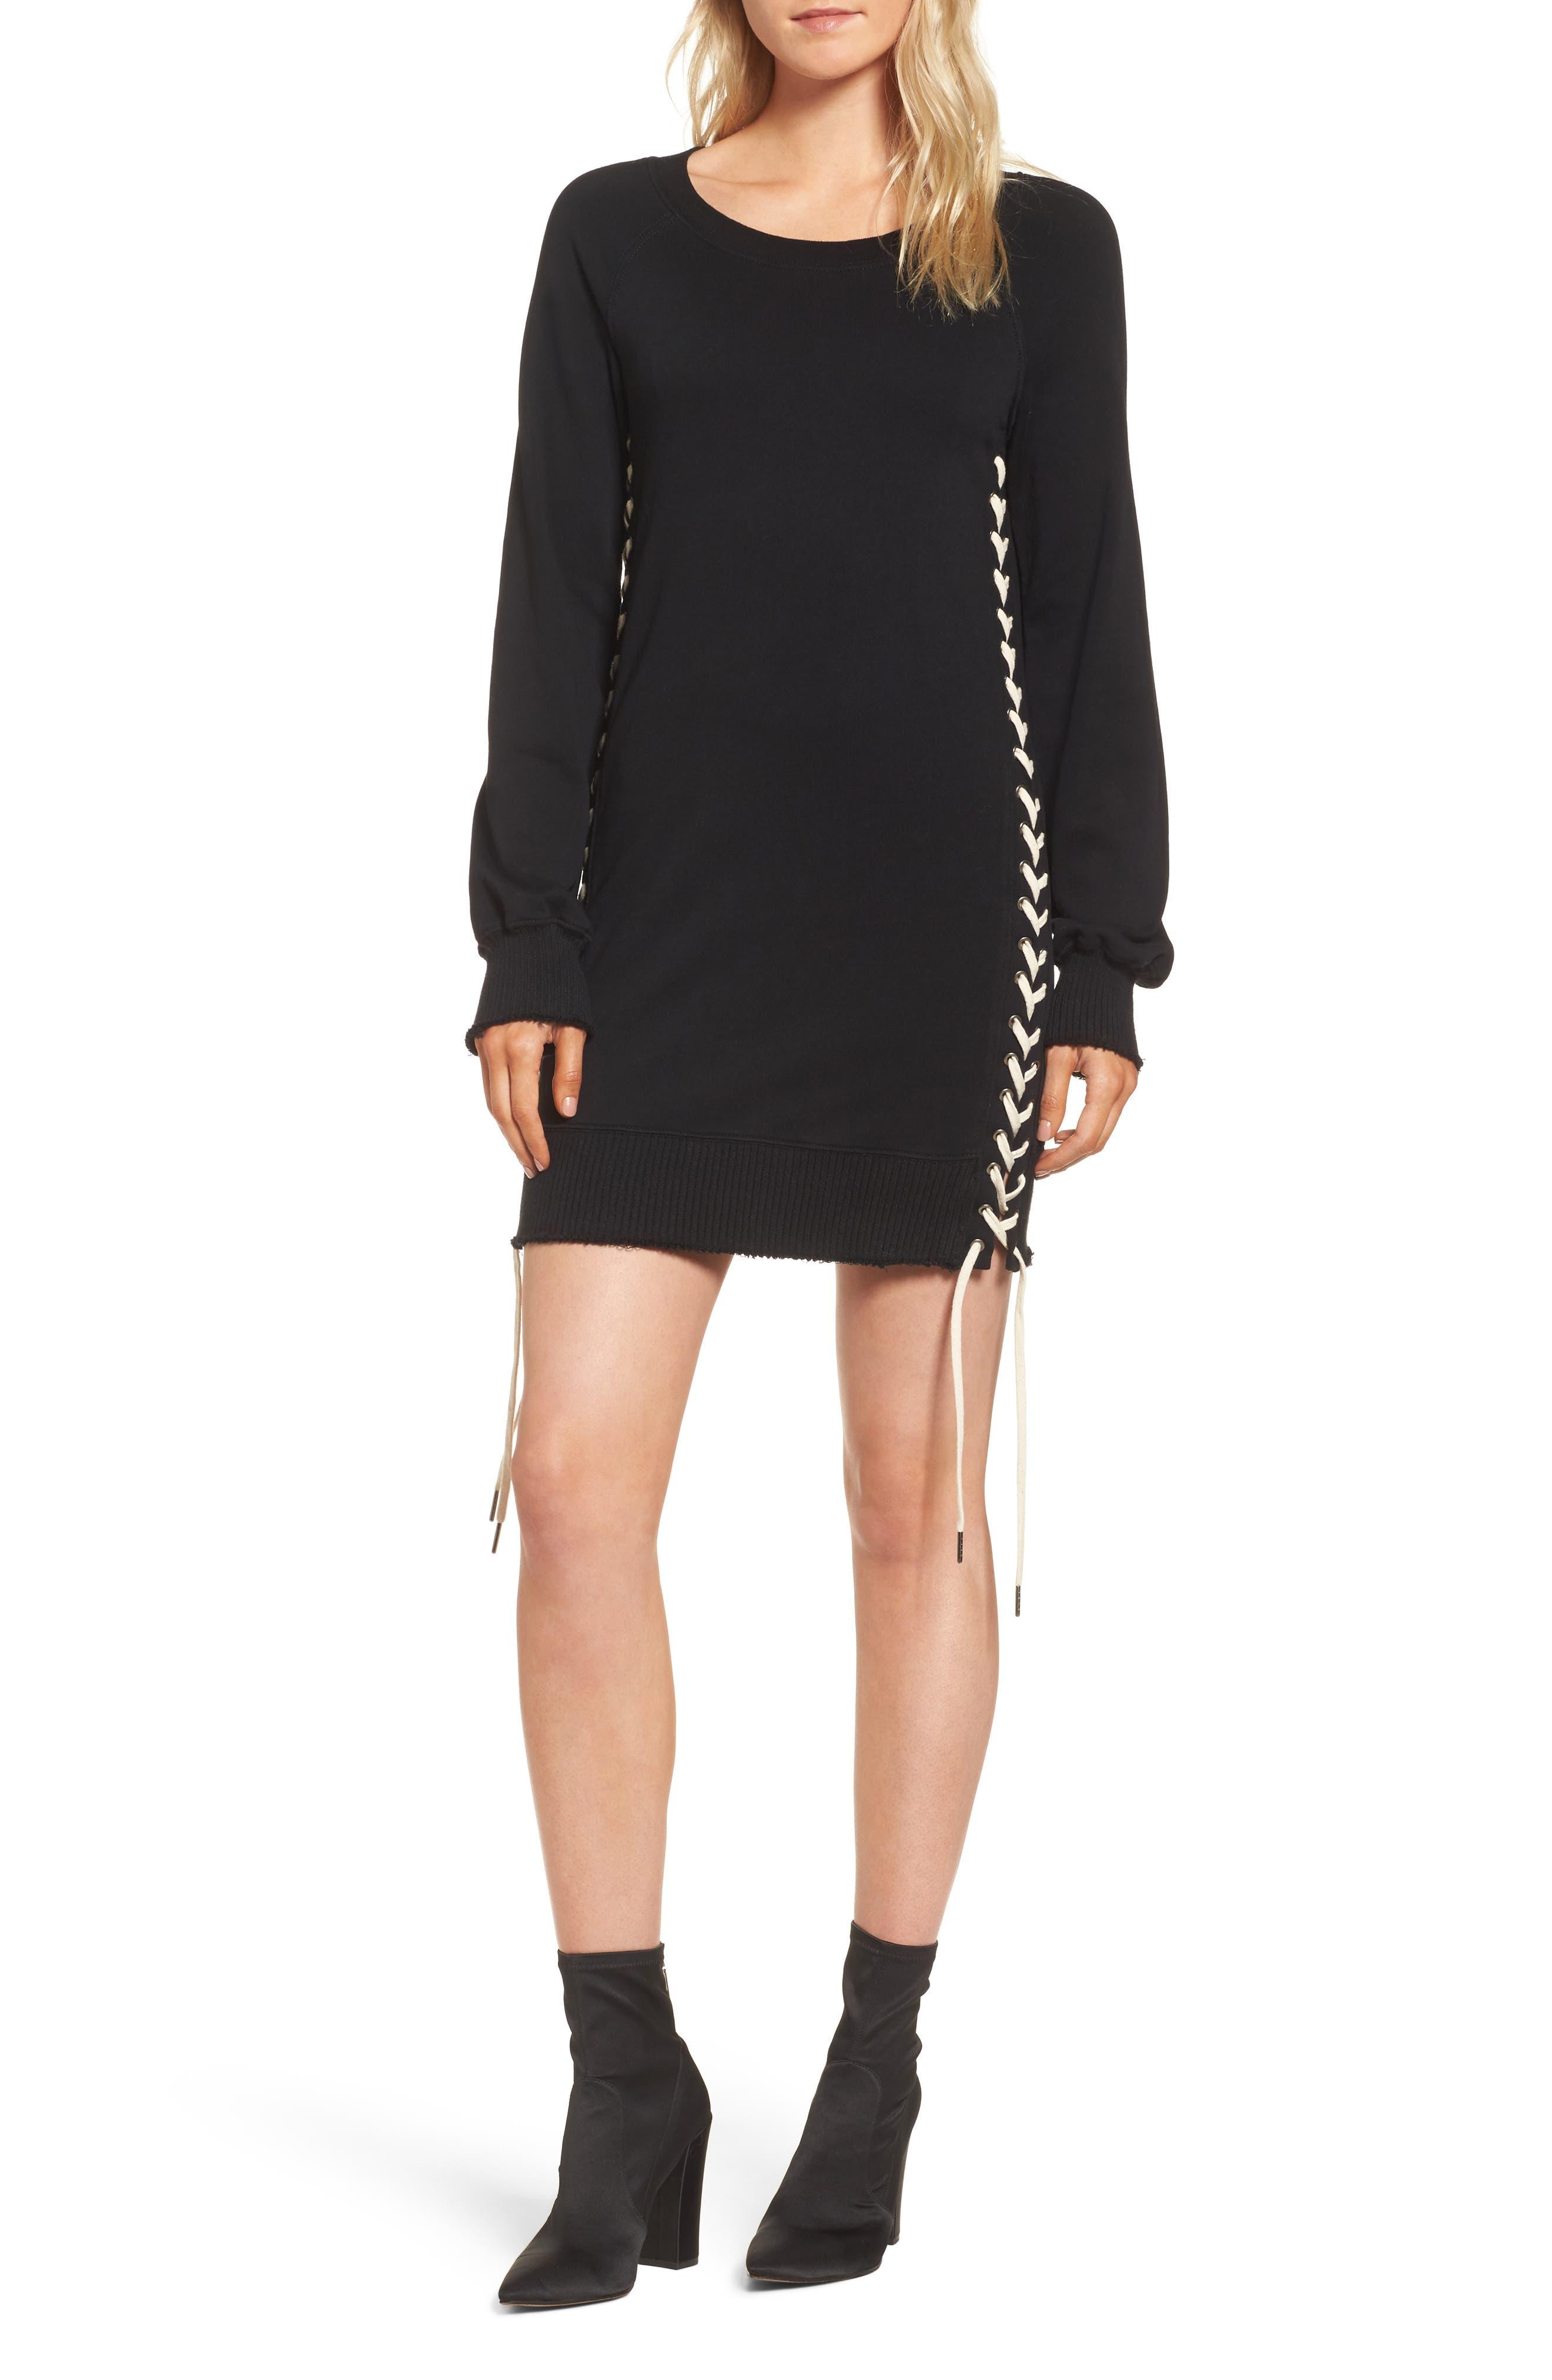 Pam & Gela Lace-Up Sweatshirt Dress